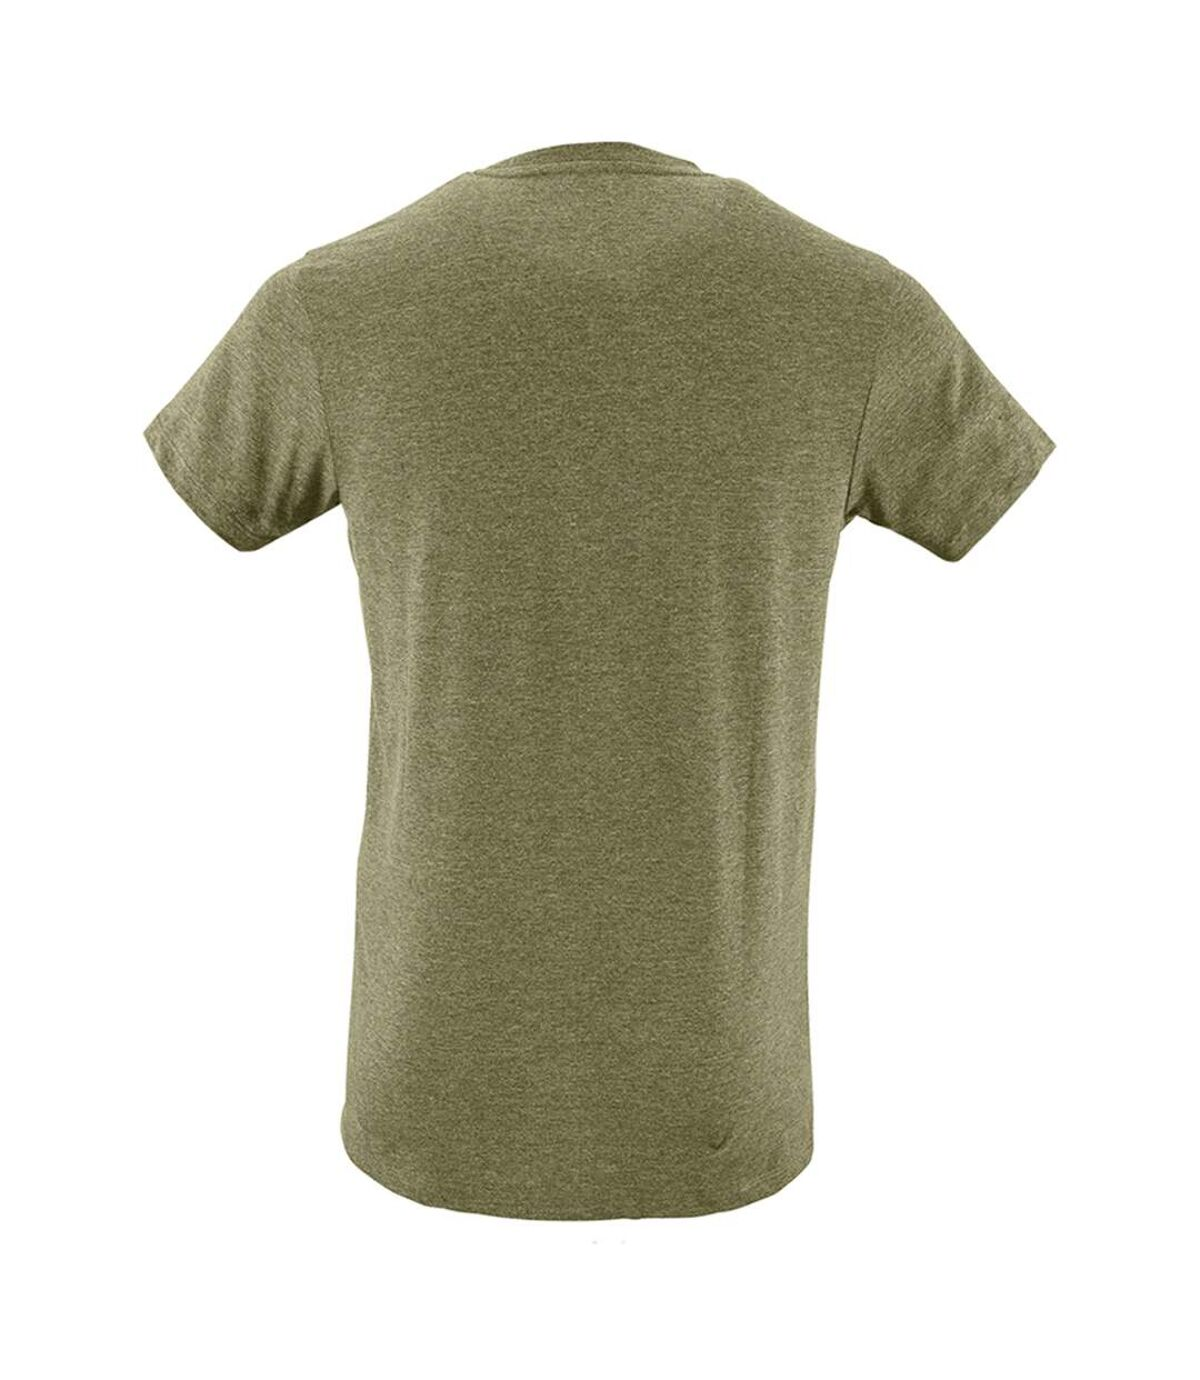 SOLS Mens Regent Slim Fit Short Sleeve T-Shirt (Heather Khaki) - UTPC506